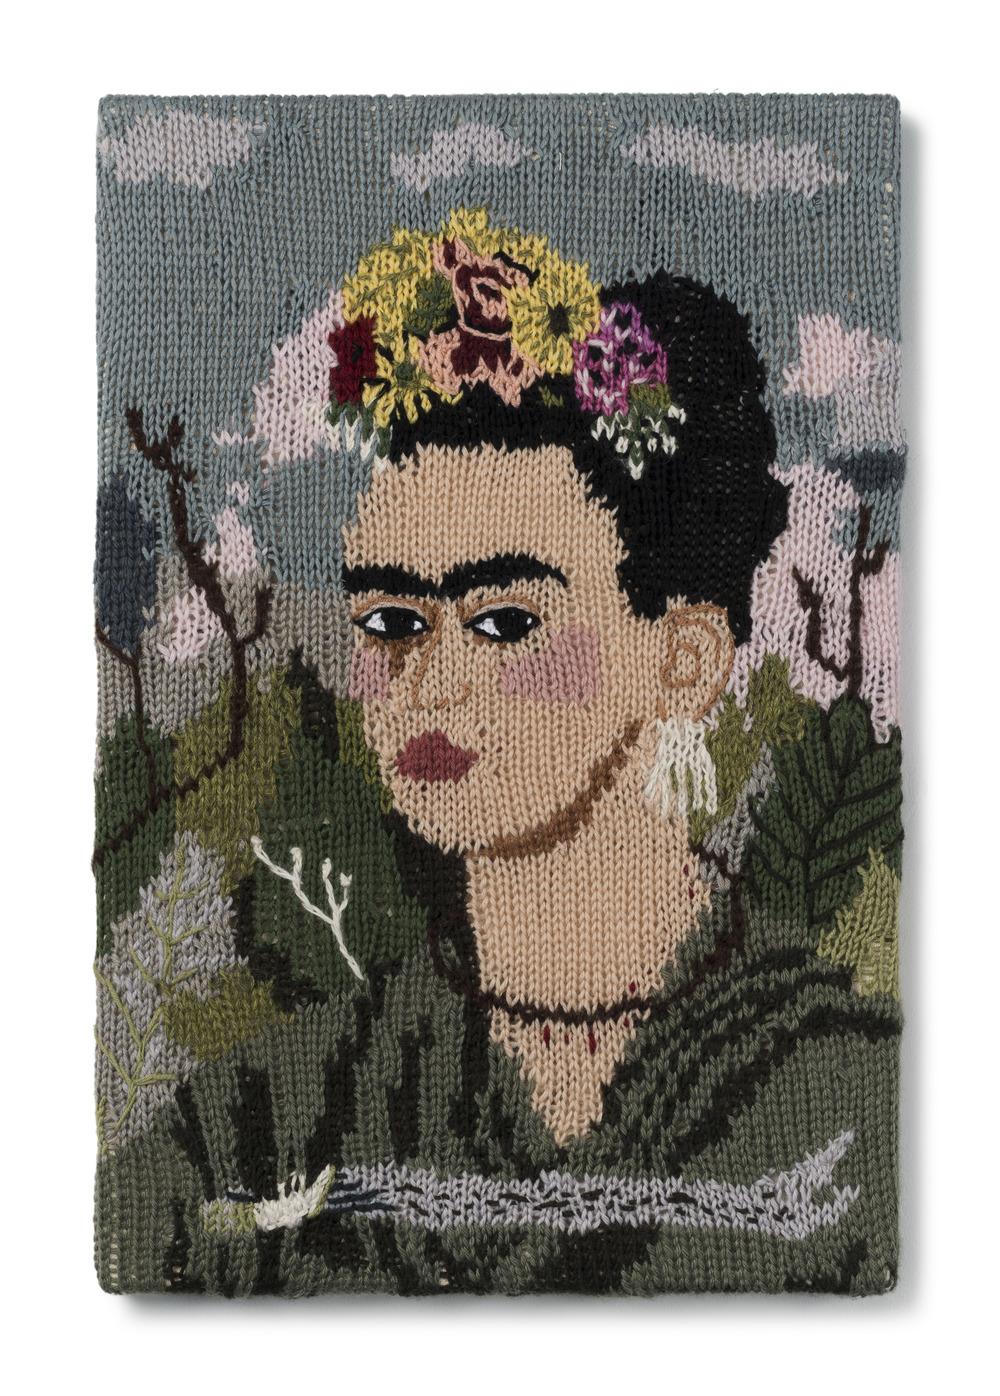 "Kate Just, Feminist Fan #14 (Frida Kahlo Self Portrait: 1940), 2015         Normal   0           false   false   false     EN-AU   JA   X-NONE                                                                                                                                                                                                                                                                                                                                                                           /* Style Definitions */  table.MsoNormalTable {mso-style-name:""Table Normal""; mso-tstyle-rowband-size:0; mso-tstyle-colband-size:0; mso-style-noshow:yes; mso-style-priority:99; mso-style-parent:""""; mso-padding-alt:0in 5.4pt 0in 5.4pt; mso-para-margin-top:0in; mso-para-margin-right:0in; mso-para-margin-bottom:10.0pt; mso-para-margin-left:0in; line-height:115%; mso-pagination:widow-orphan; font-size:11.0pt; font-family:""Calibri"",""sans-serif""; mso-ascii-font-family:Calibri; mso-ascii-theme-font:minor-latin; mso-hansi-font-family:Calibri; mso-hansi-theme-font:minor-latin; mso-fareast-language:EN-US;}"